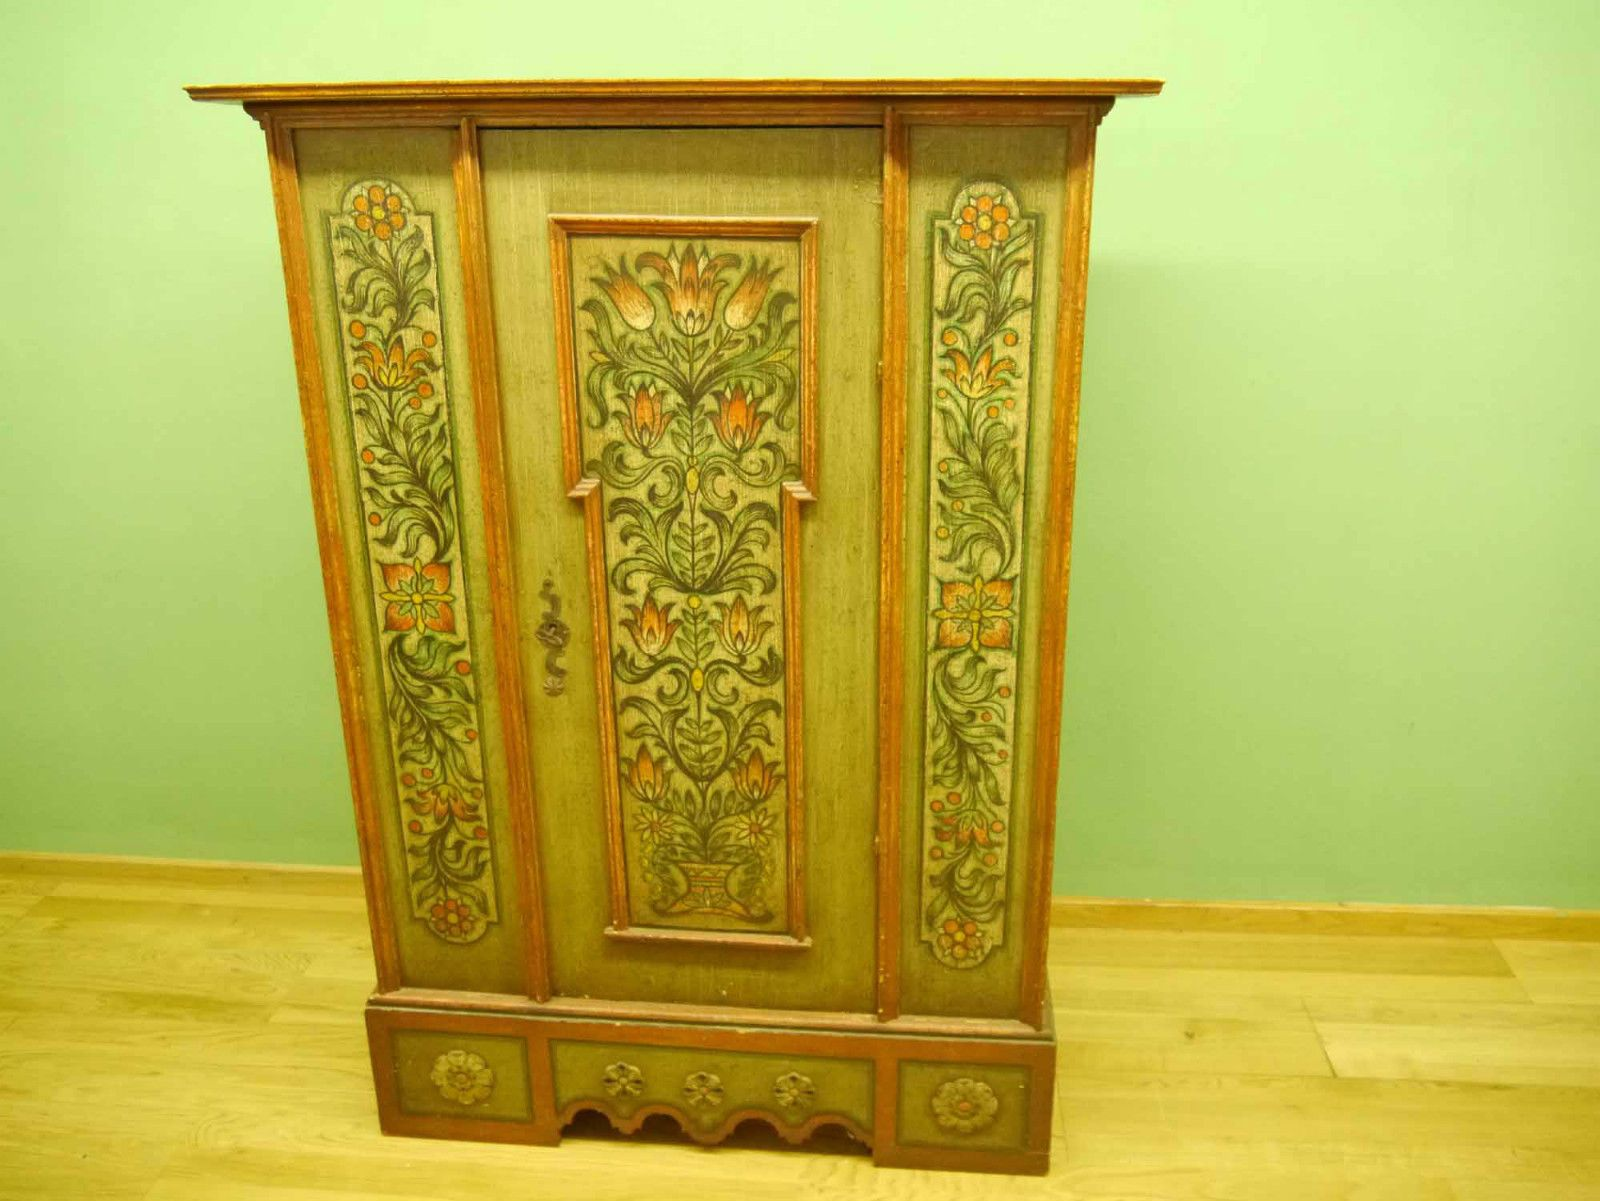 details zu org biedermeier kommode um 1830 kiefer restauriert weichholz meubels pinterest. Black Bedroom Furniture Sets. Home Design Ideas